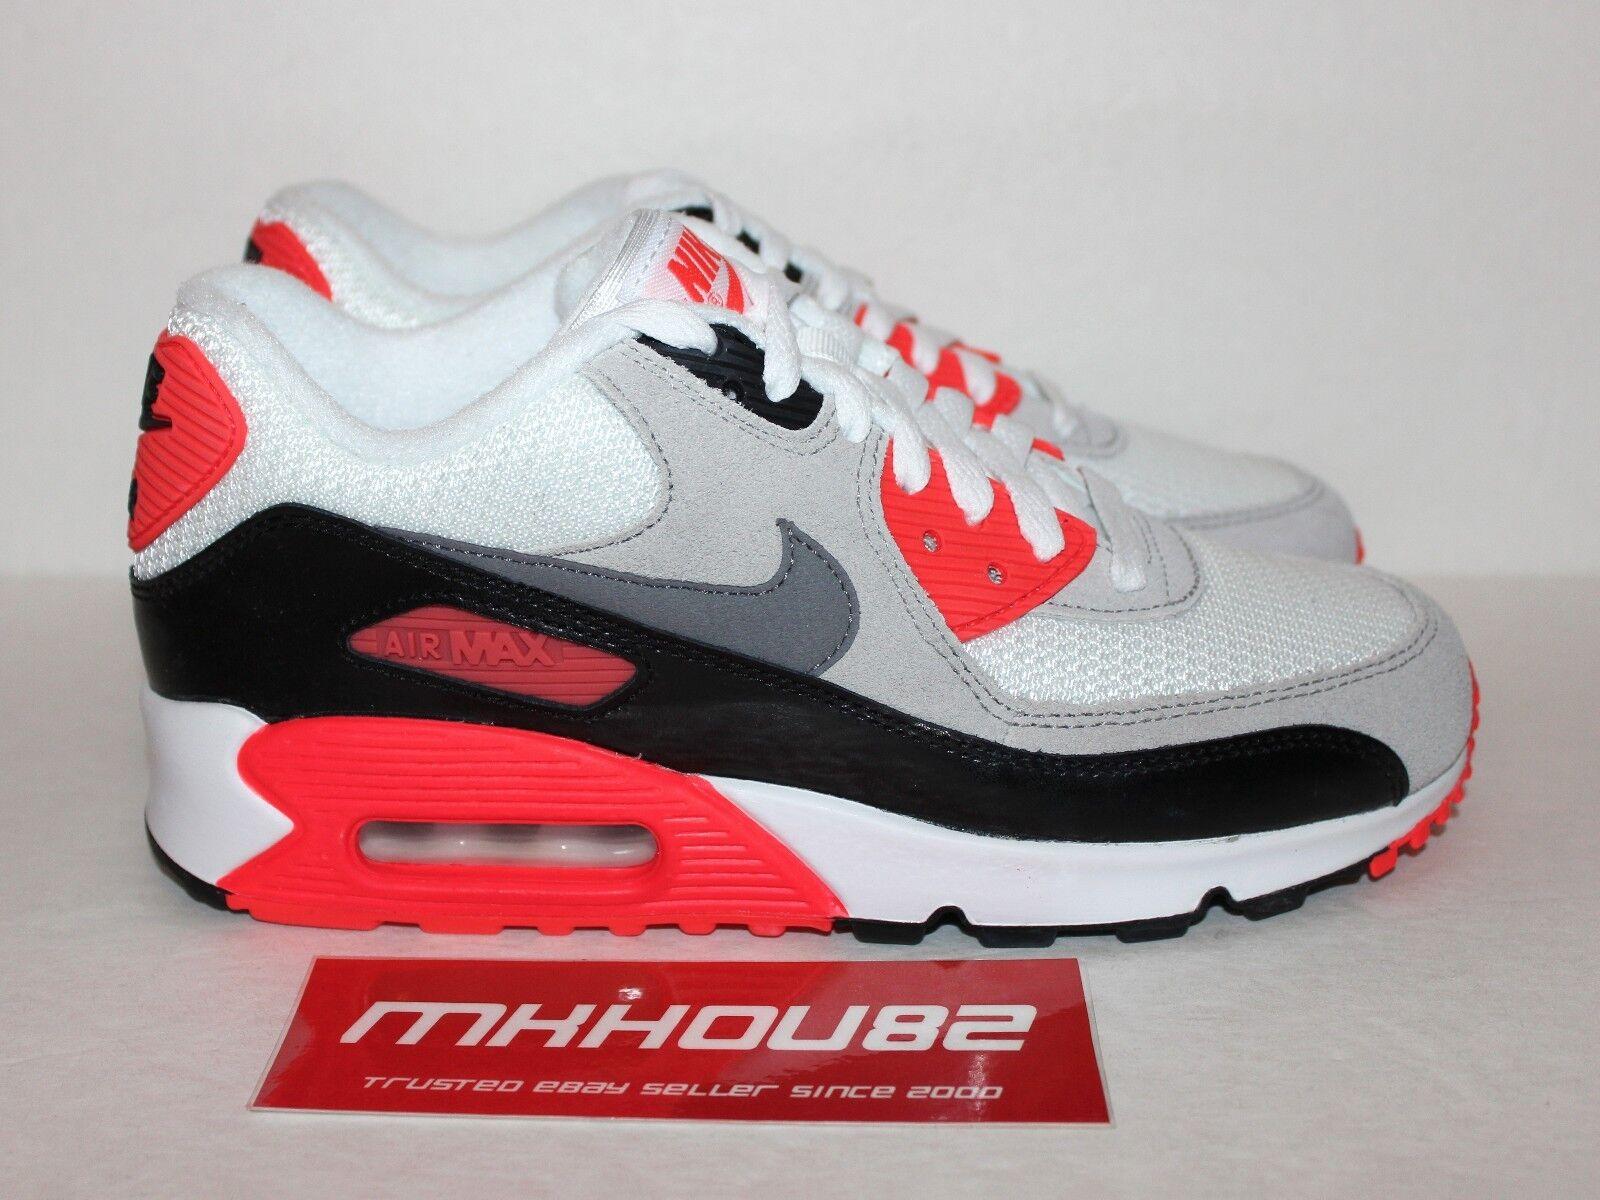 New Nike Air Max 90 Premium Infrared White Shoes Rare Size Uomo 6 Donna 7.5